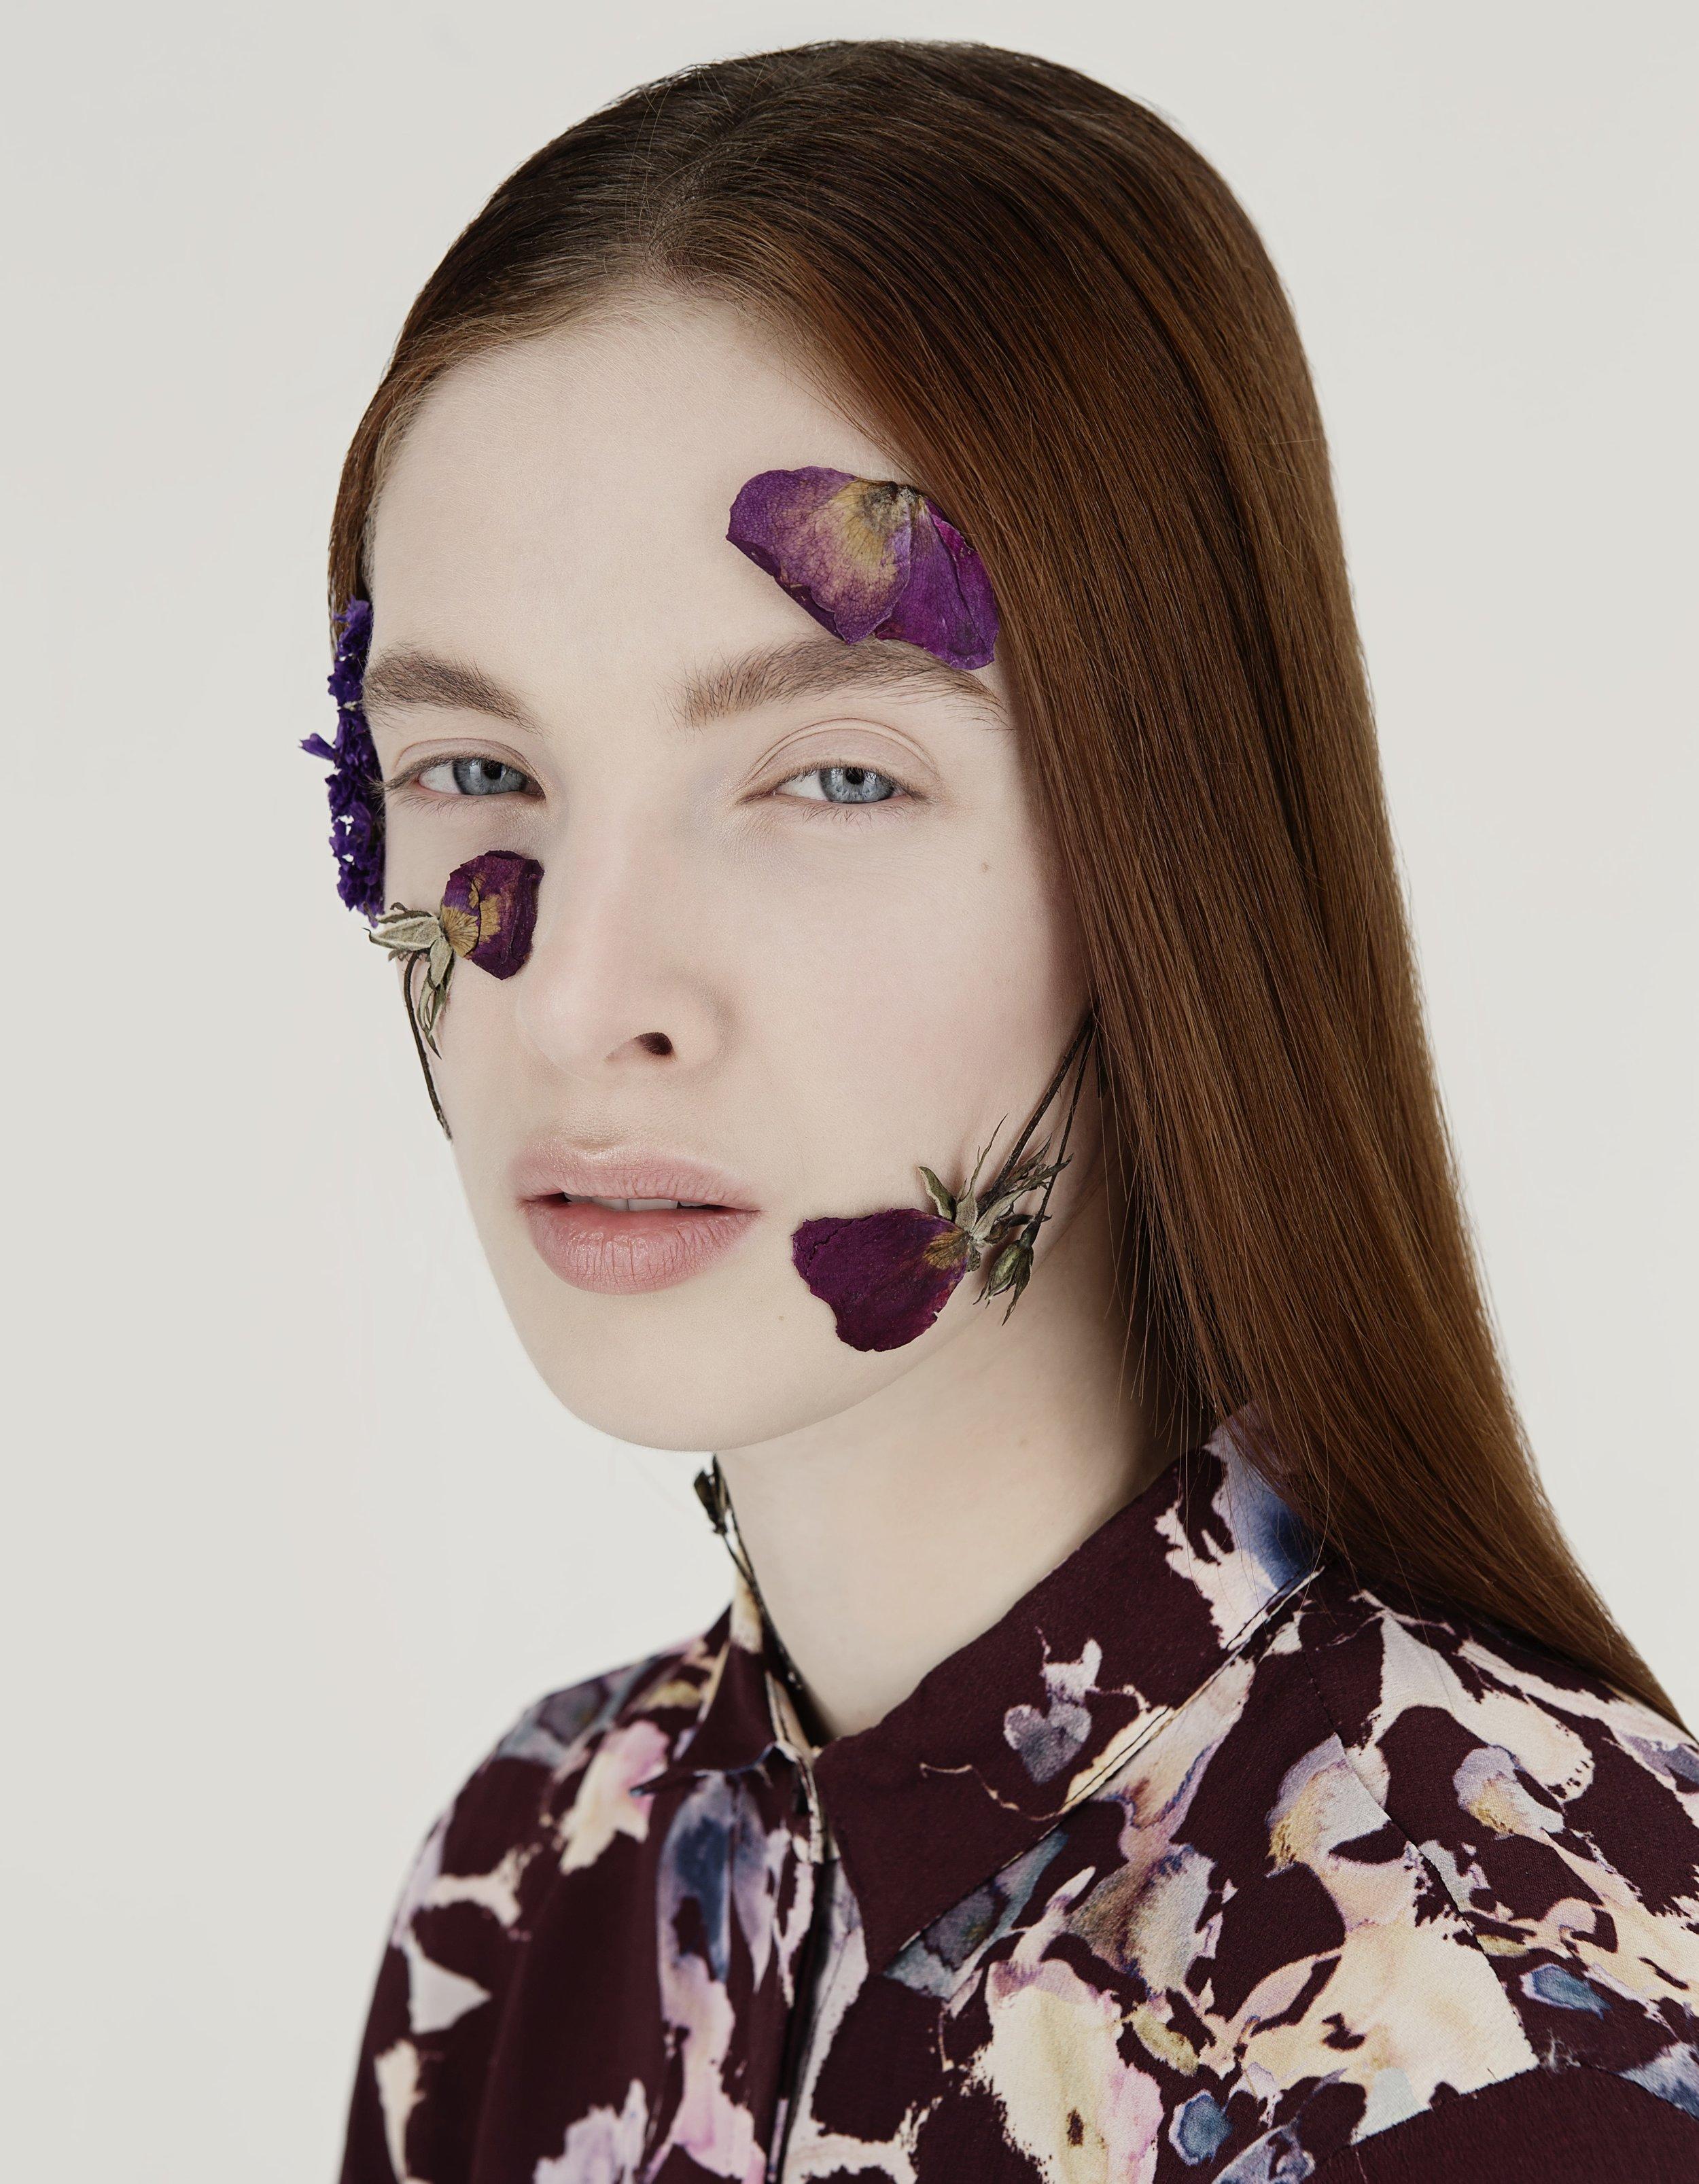 PHOTOGRAPHY Denise Boomkens @ Sticky Stuff   MUAH Alexandra Leijs   MODEL Gesine @ Micha Models